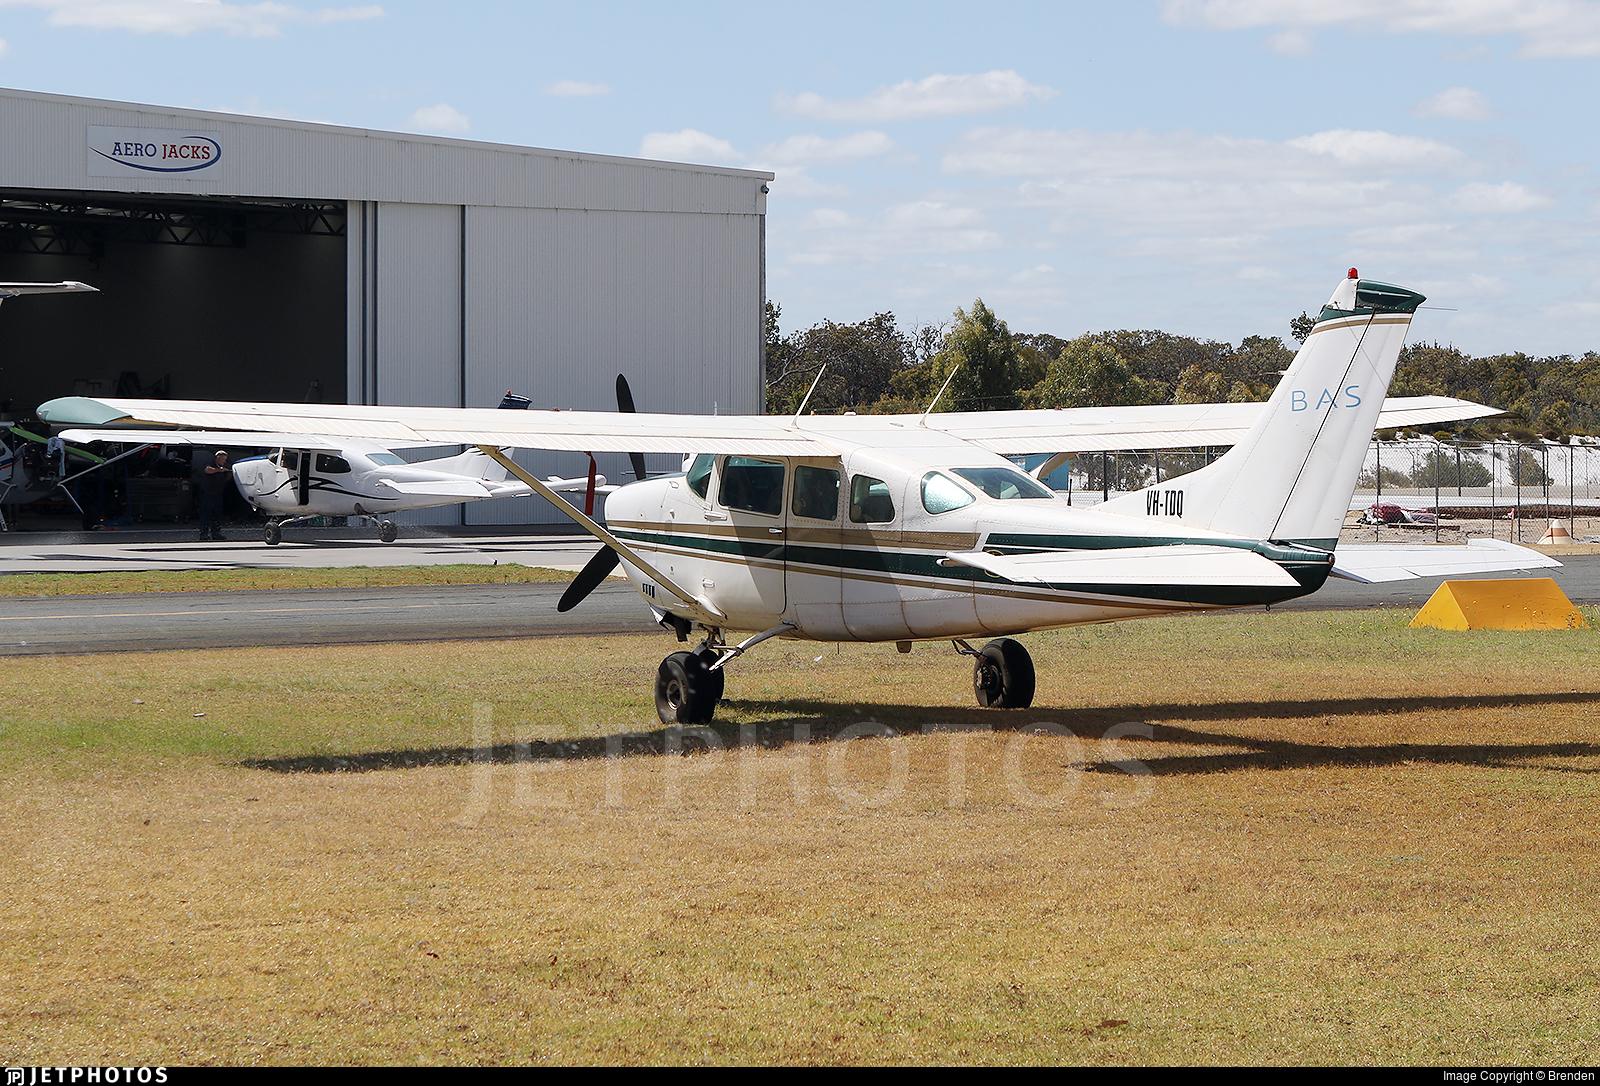 VH-TDQ - Cessna U206F Stationair 6 - Broome Air Services